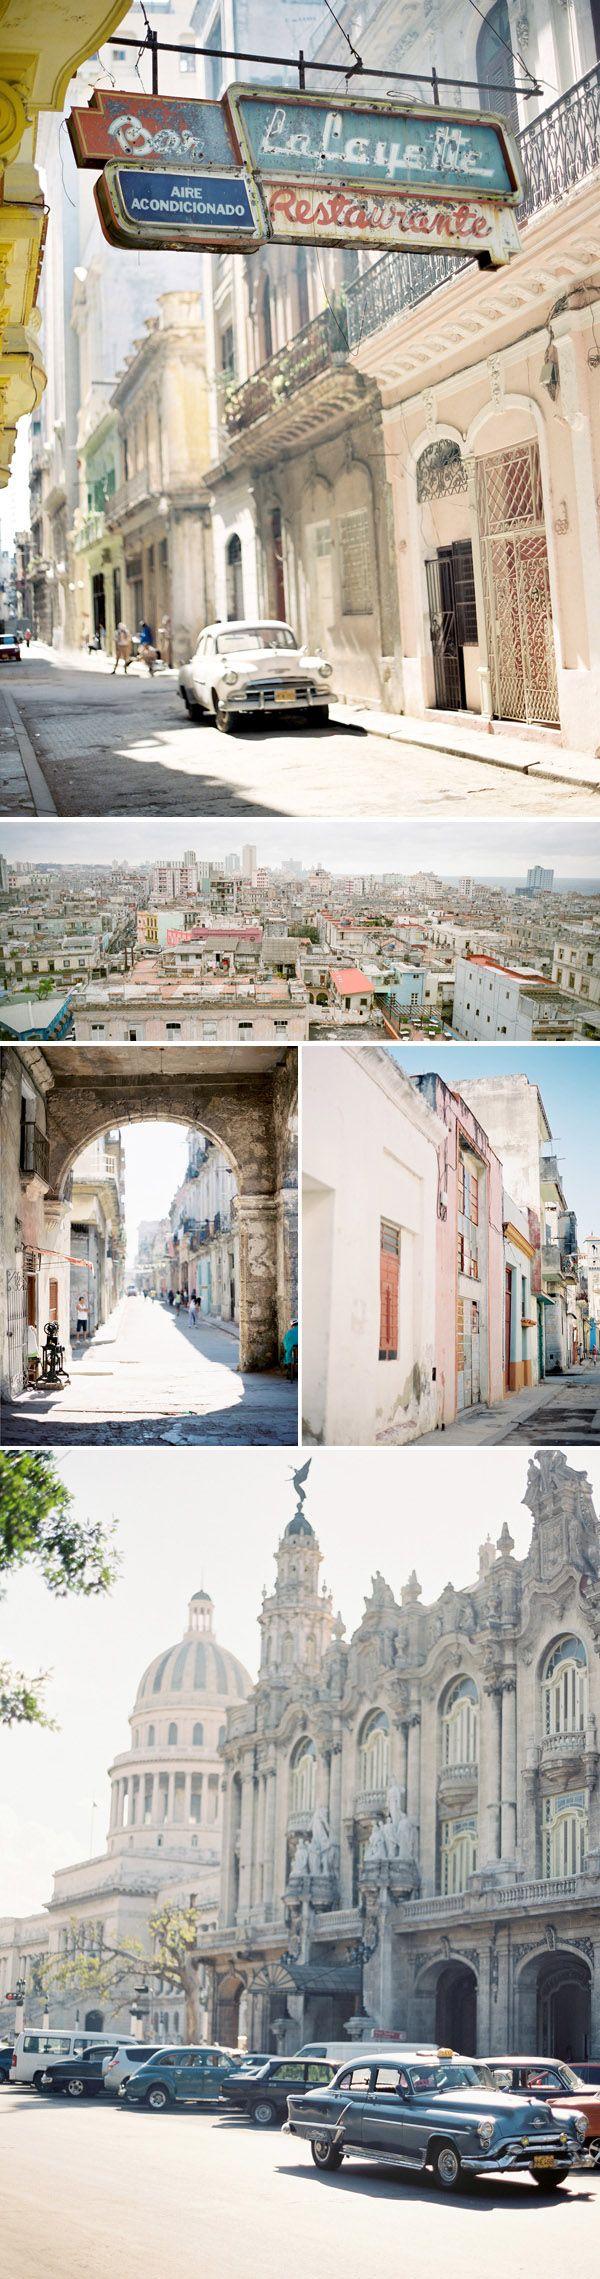 Todo en ruinas. Que vergüenza que gran pena. architecture-of-cuba-jose-villa pinky blushed town!!!!